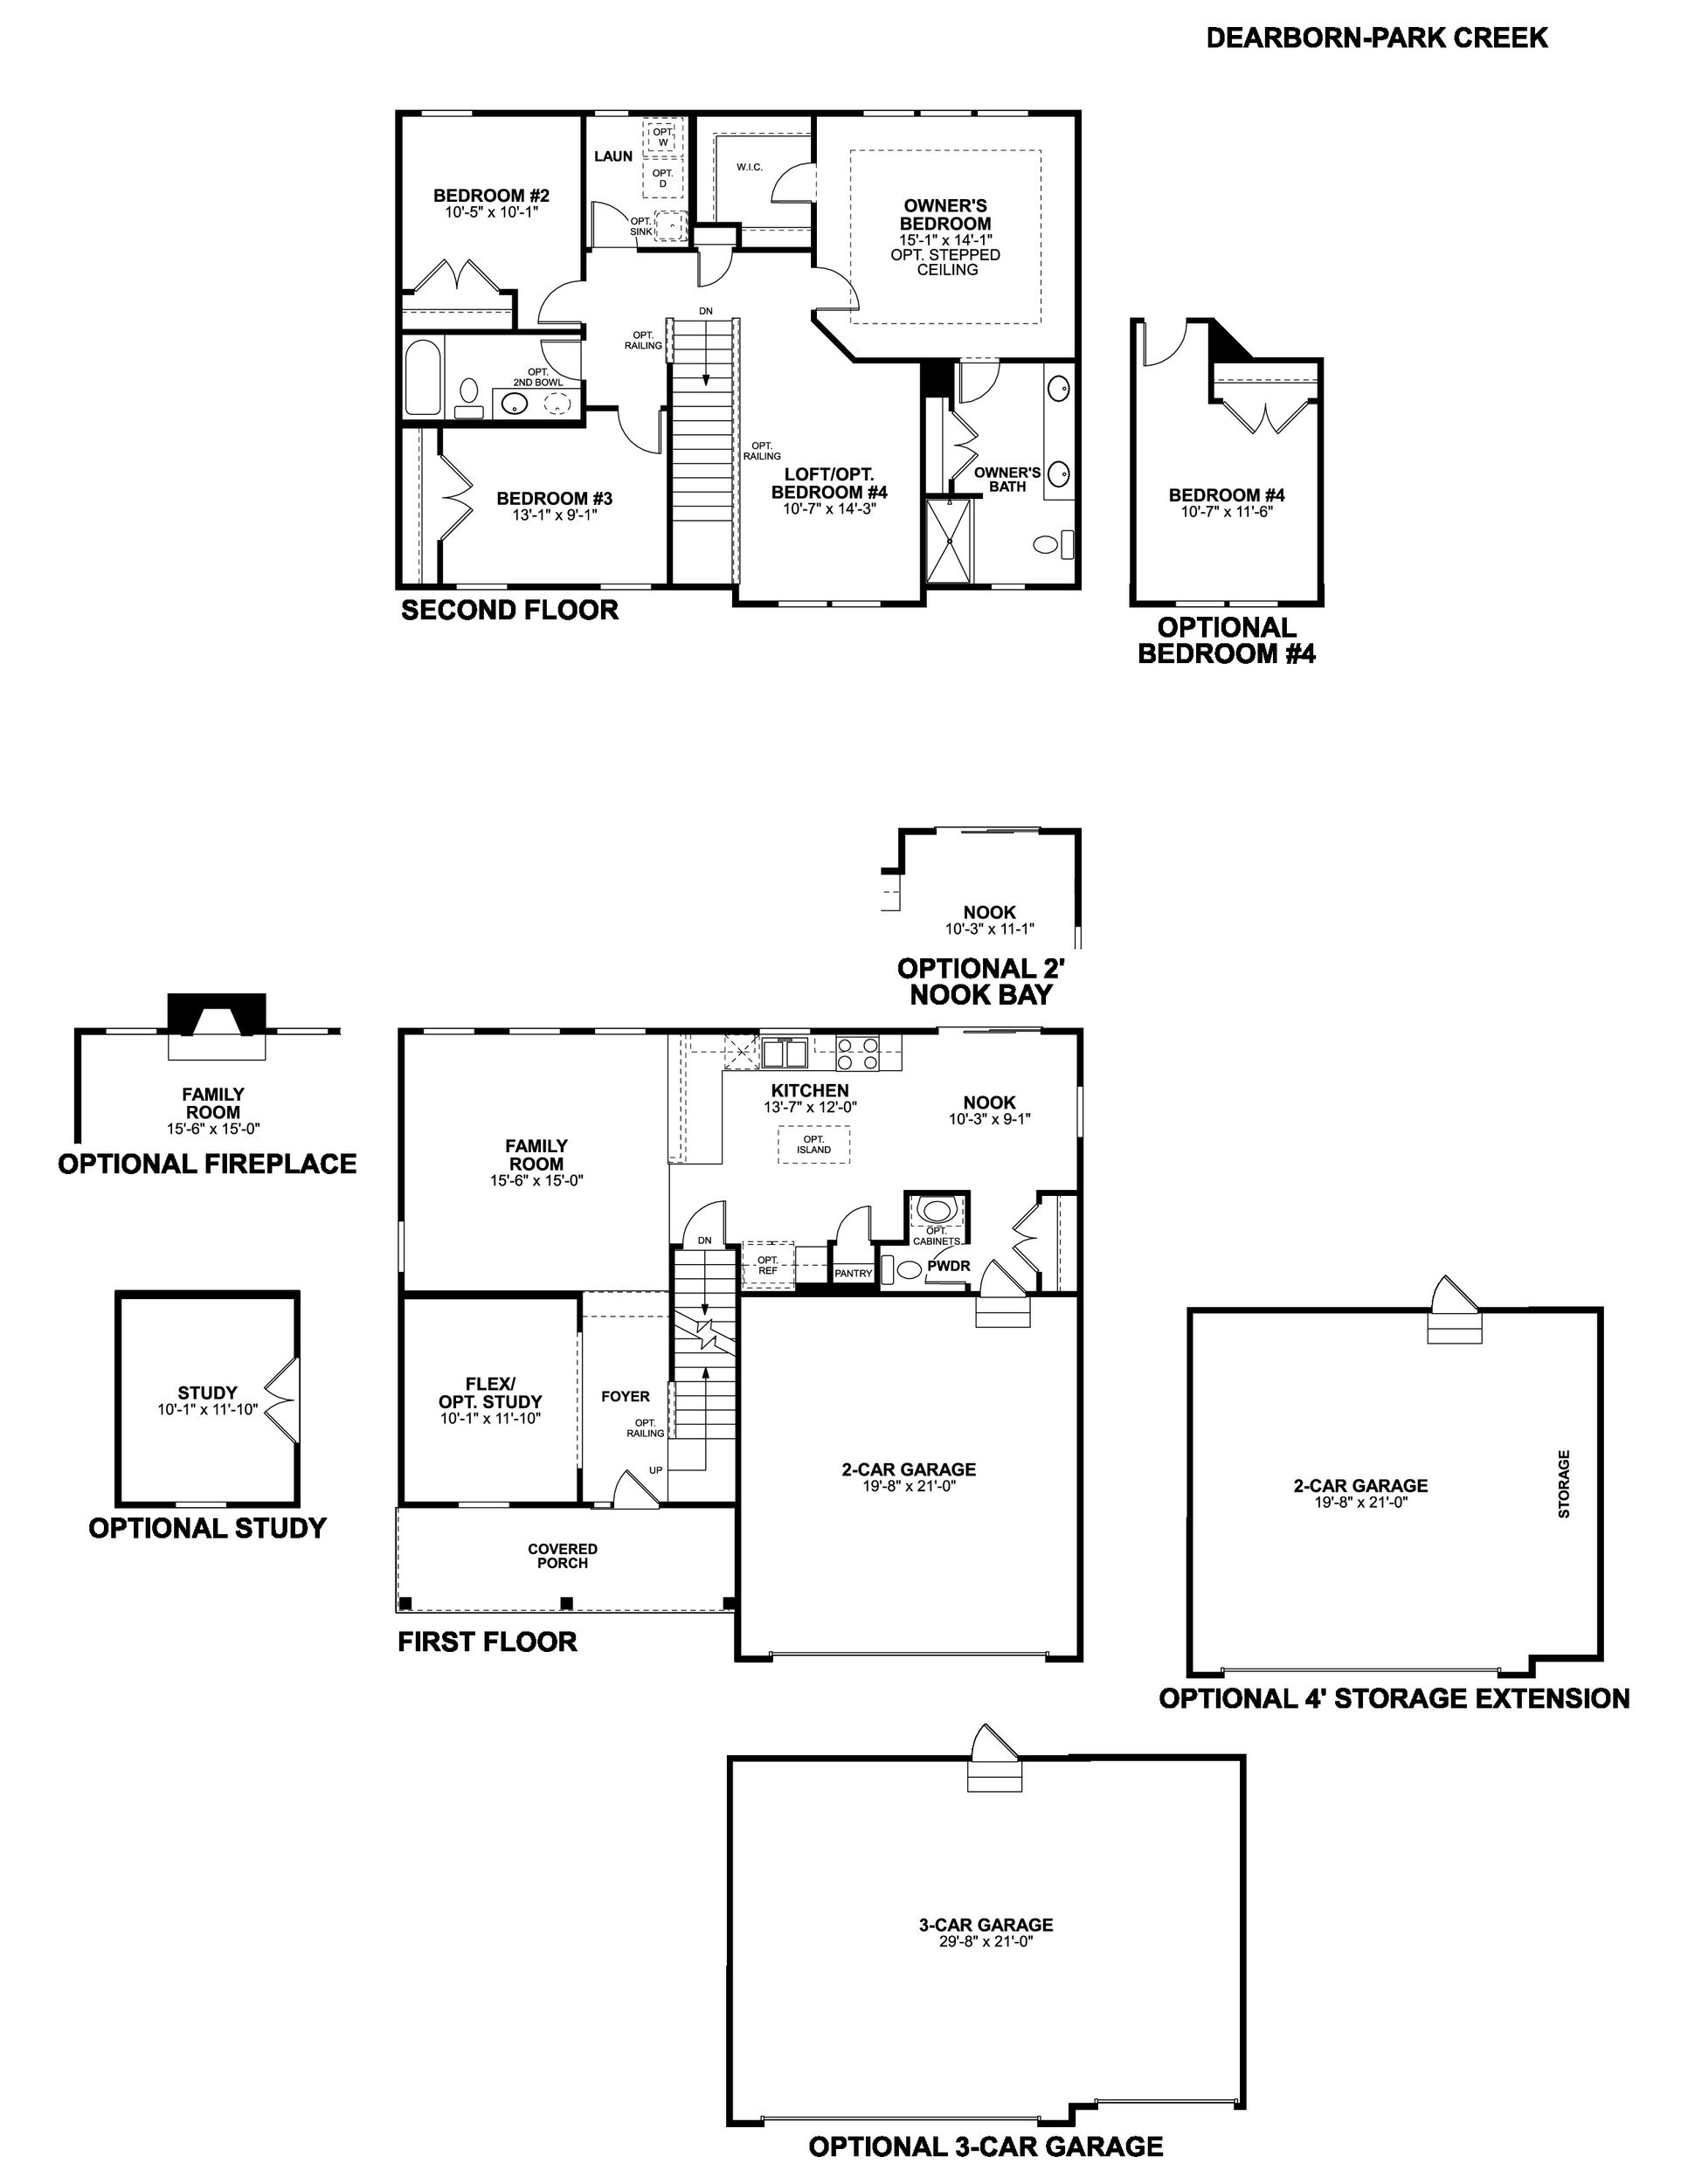 Park Creek Dearborn Floorplan